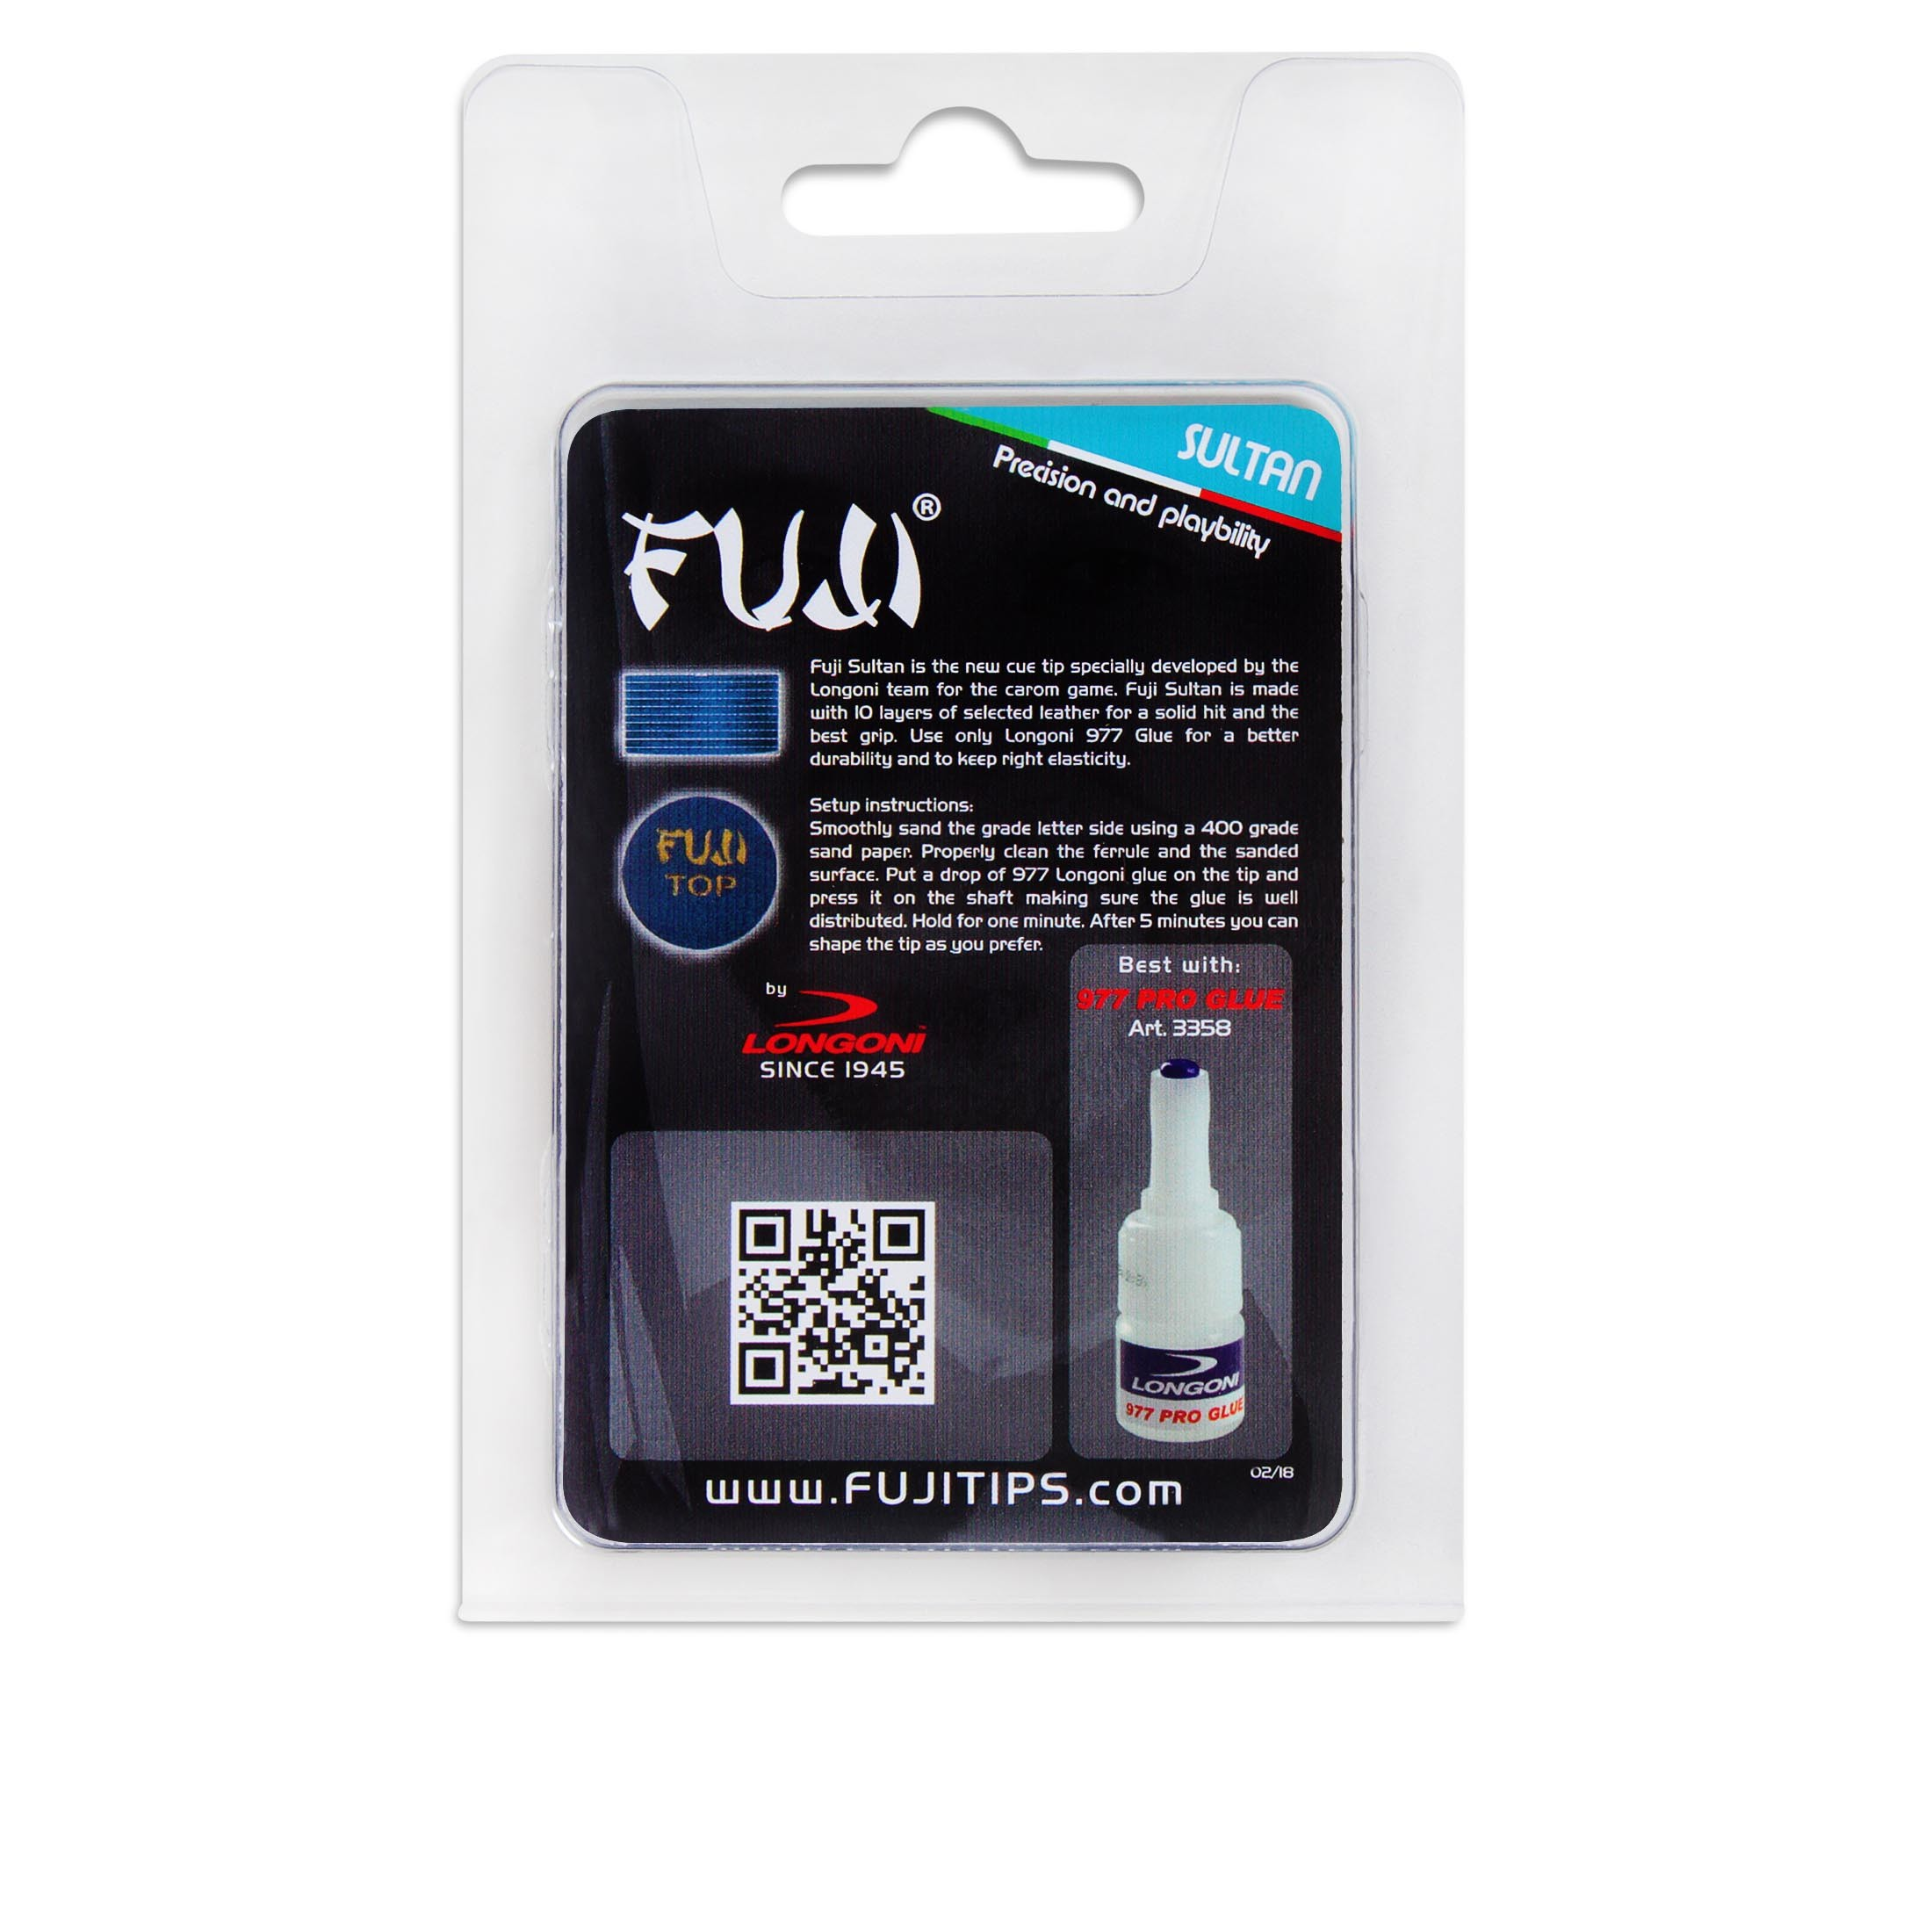 Наклейка для кия Longoni Fuji Sultan ø14мм Soft 1шт.